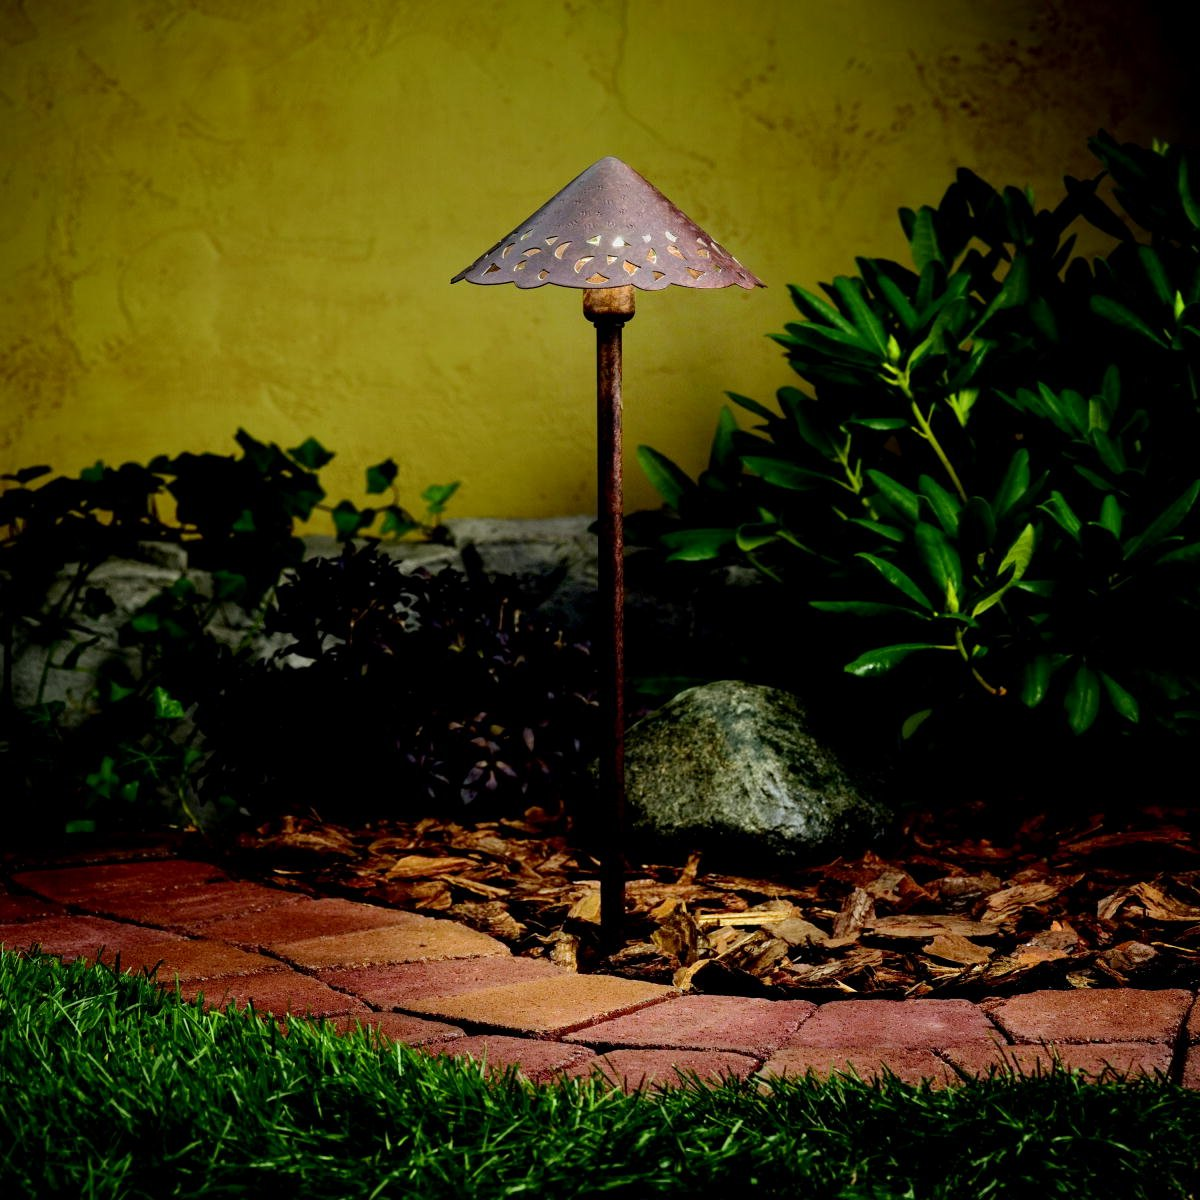 Kichler 15443TZT One Light Path & Spread by Kichler Lighting